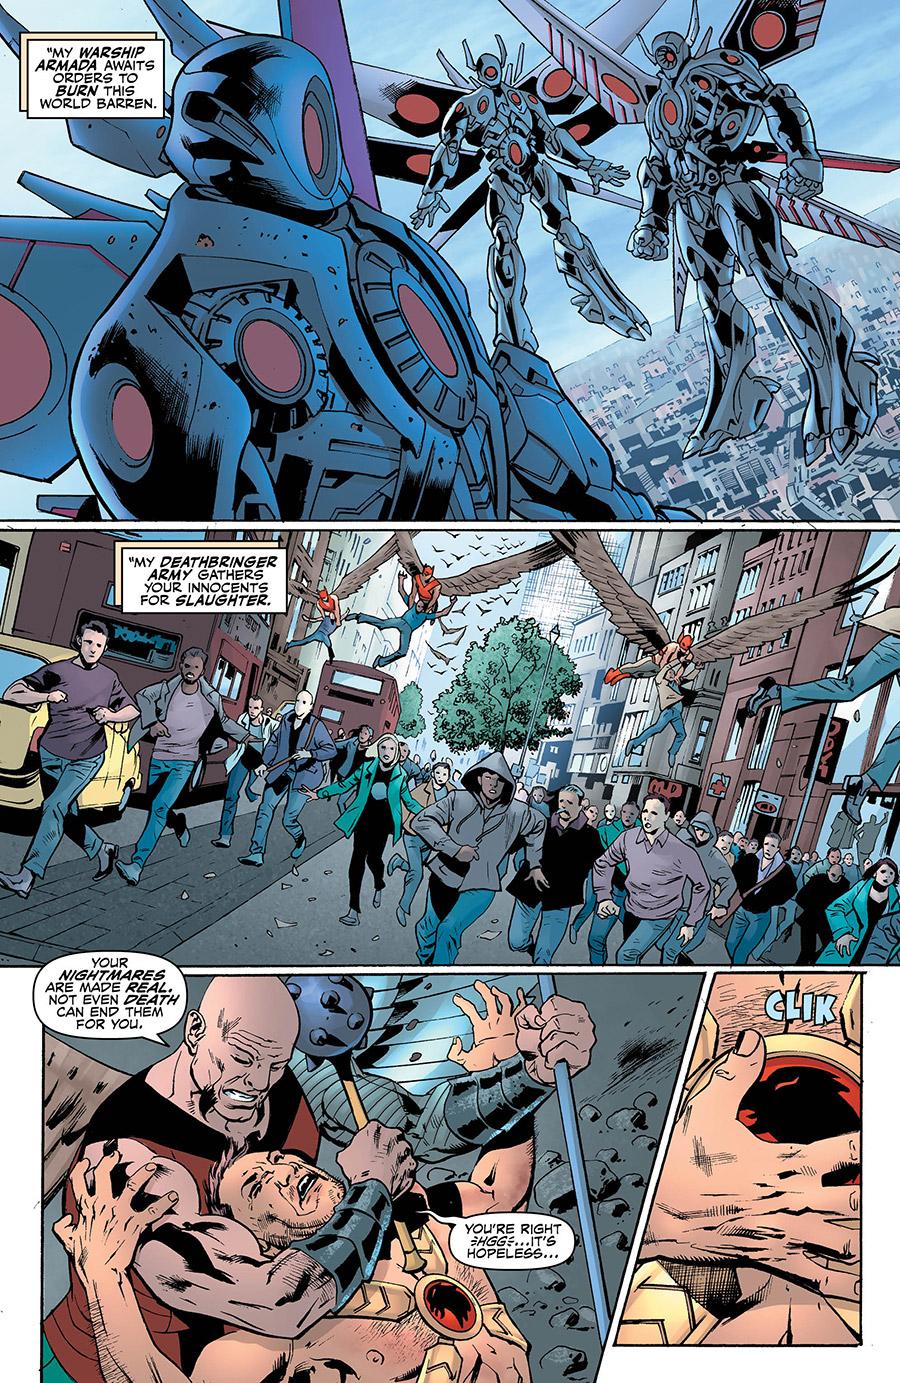 Hawkman 10_2 - DC Comics News